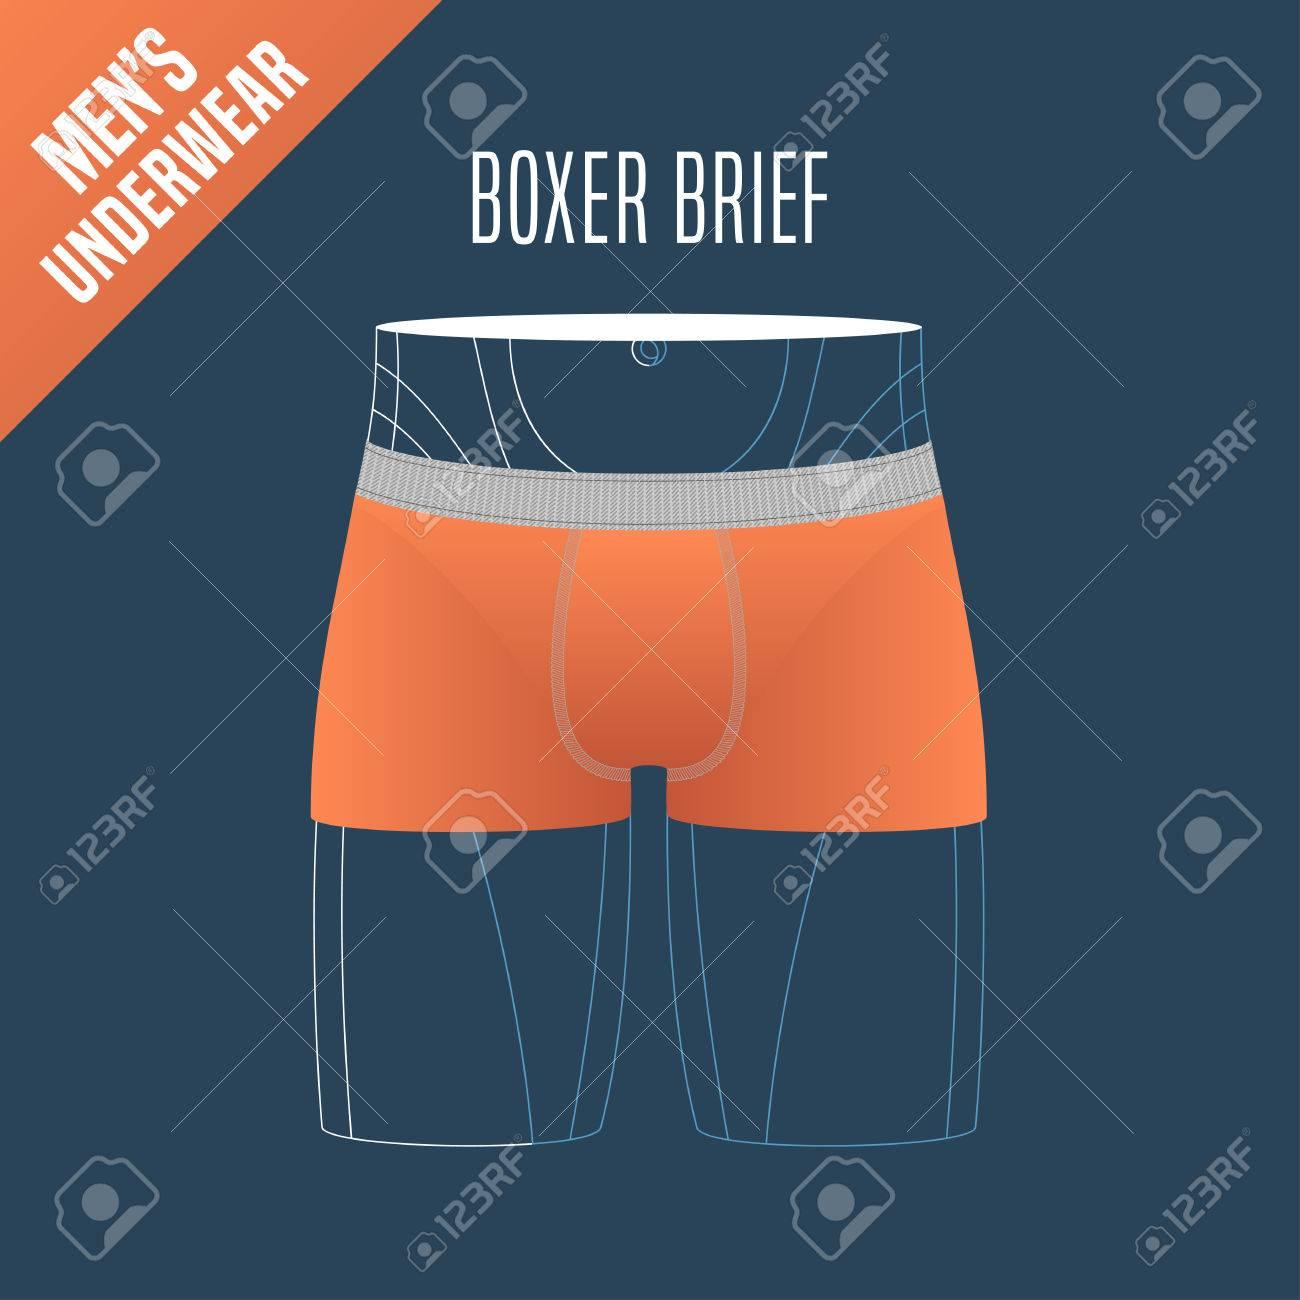 3d4addea719 Men s underwear vector illustration. Design element for boxer brief